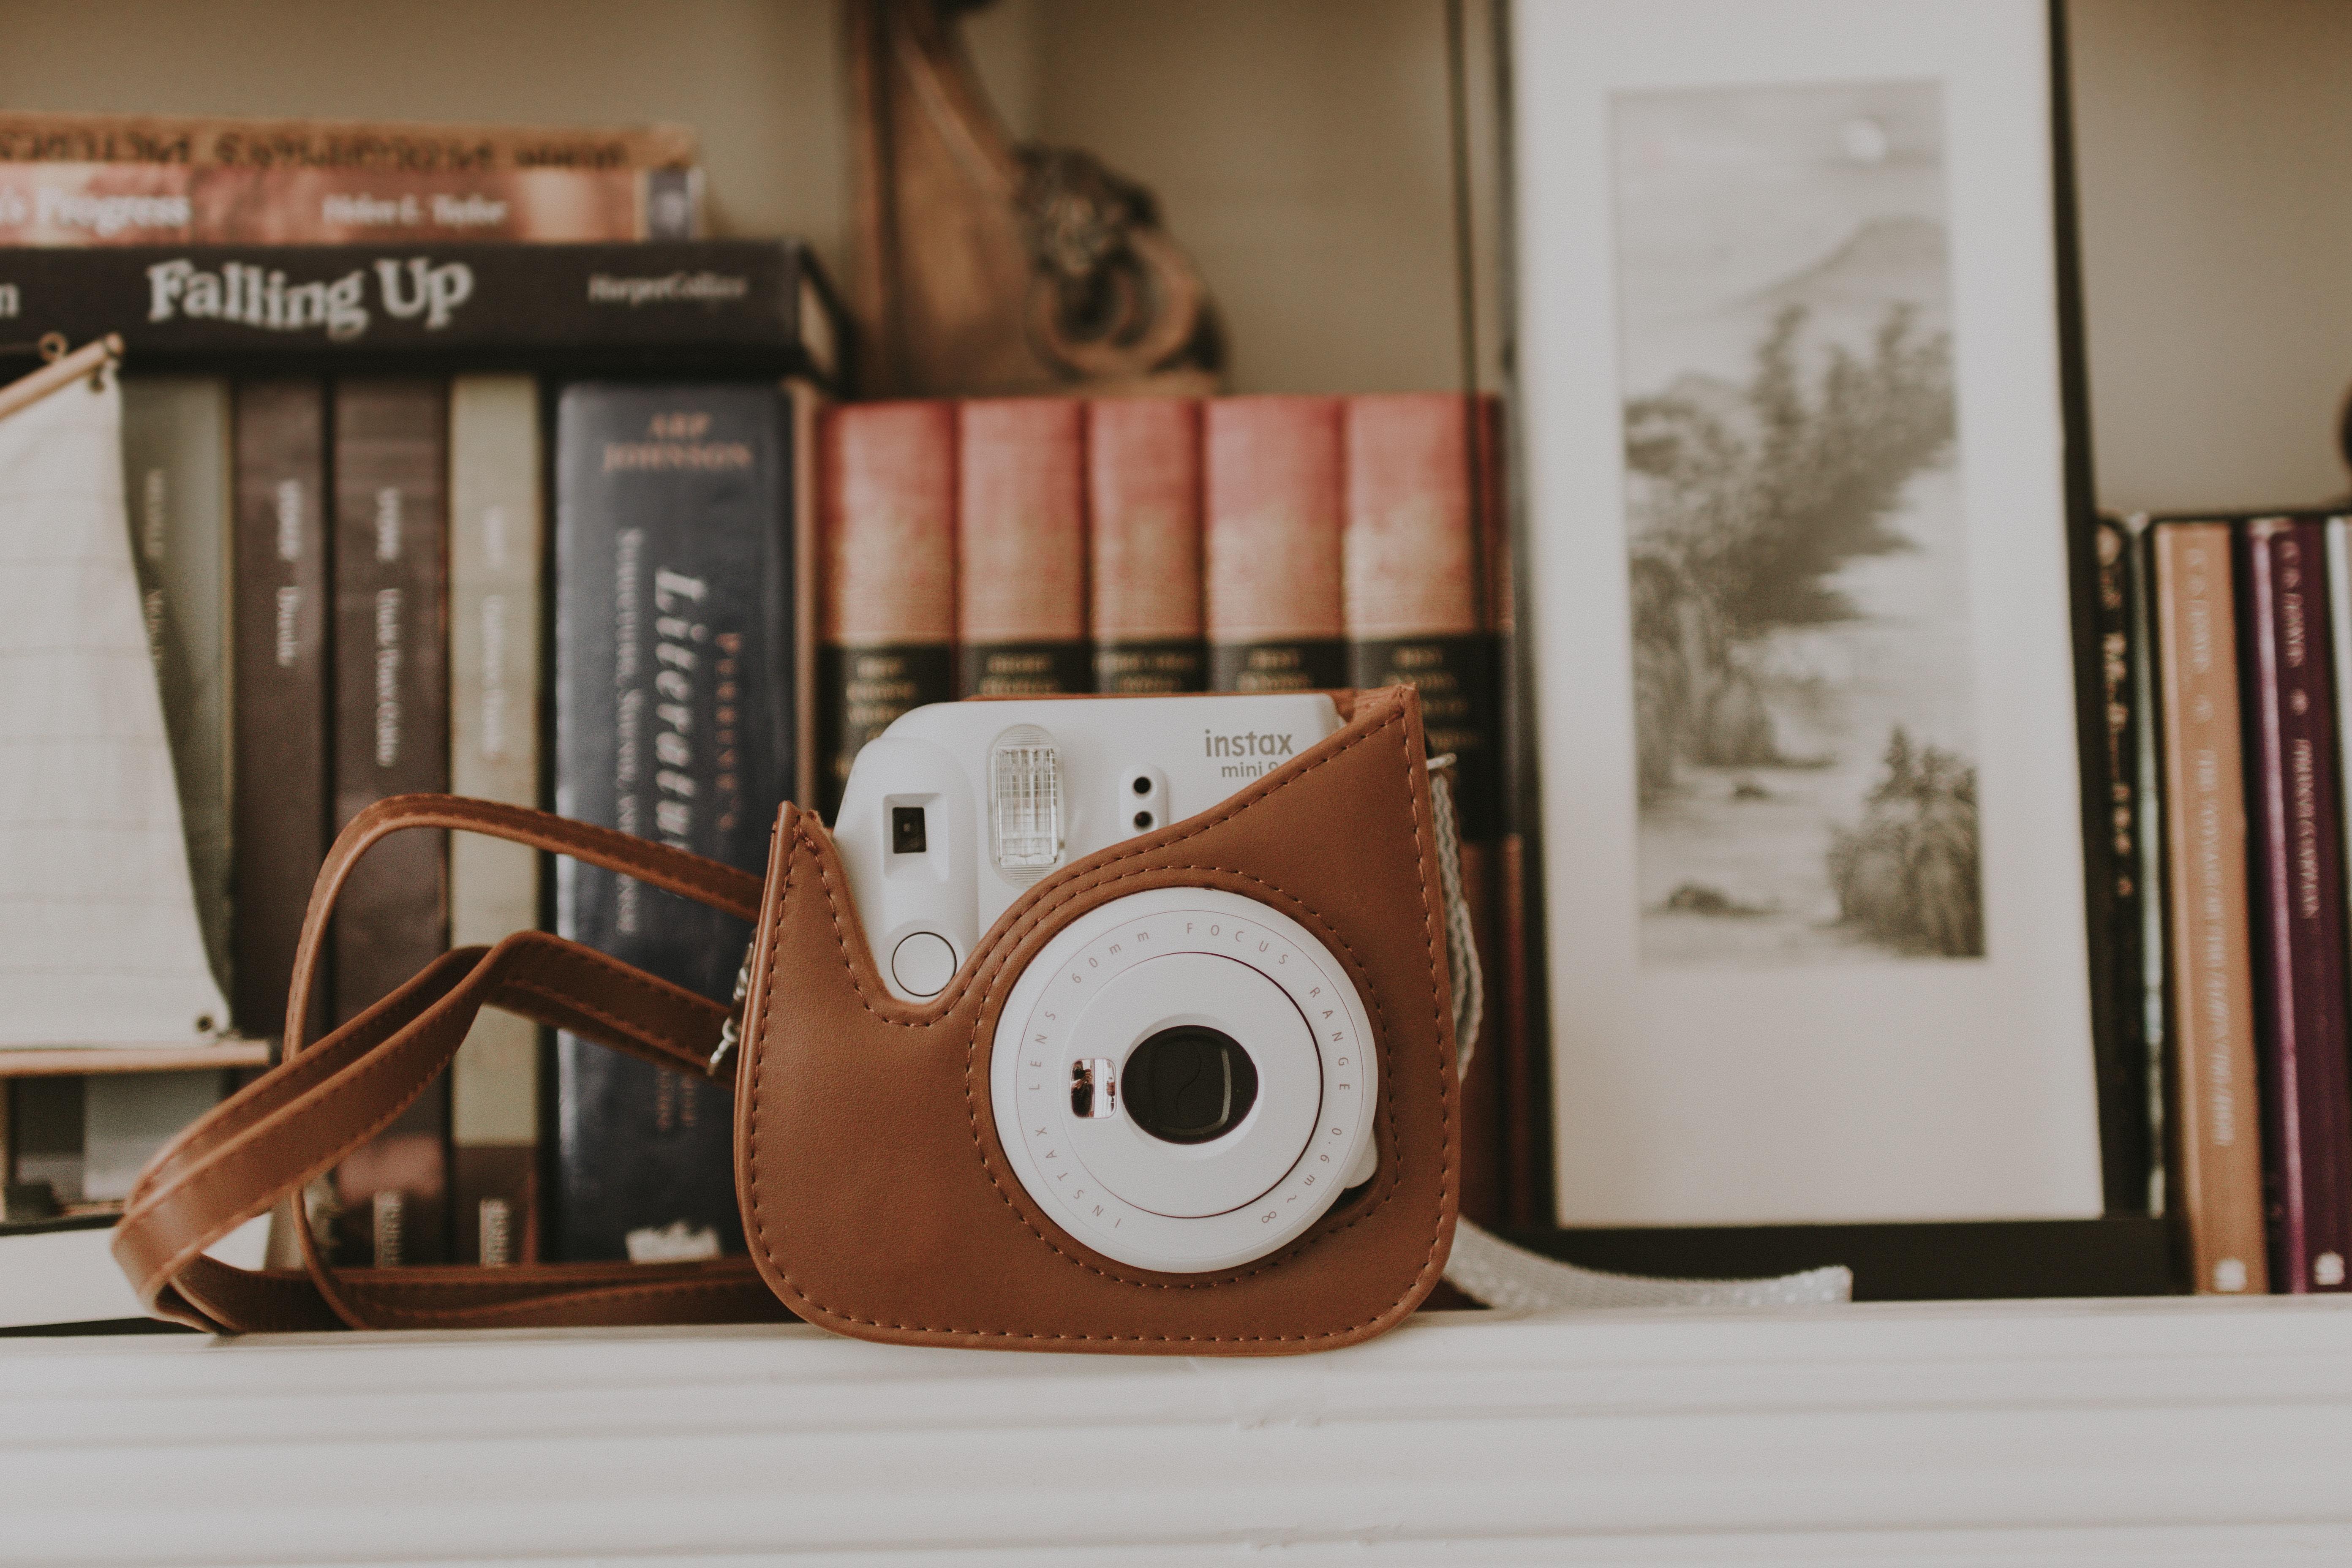 white FujiFilm Instax camera